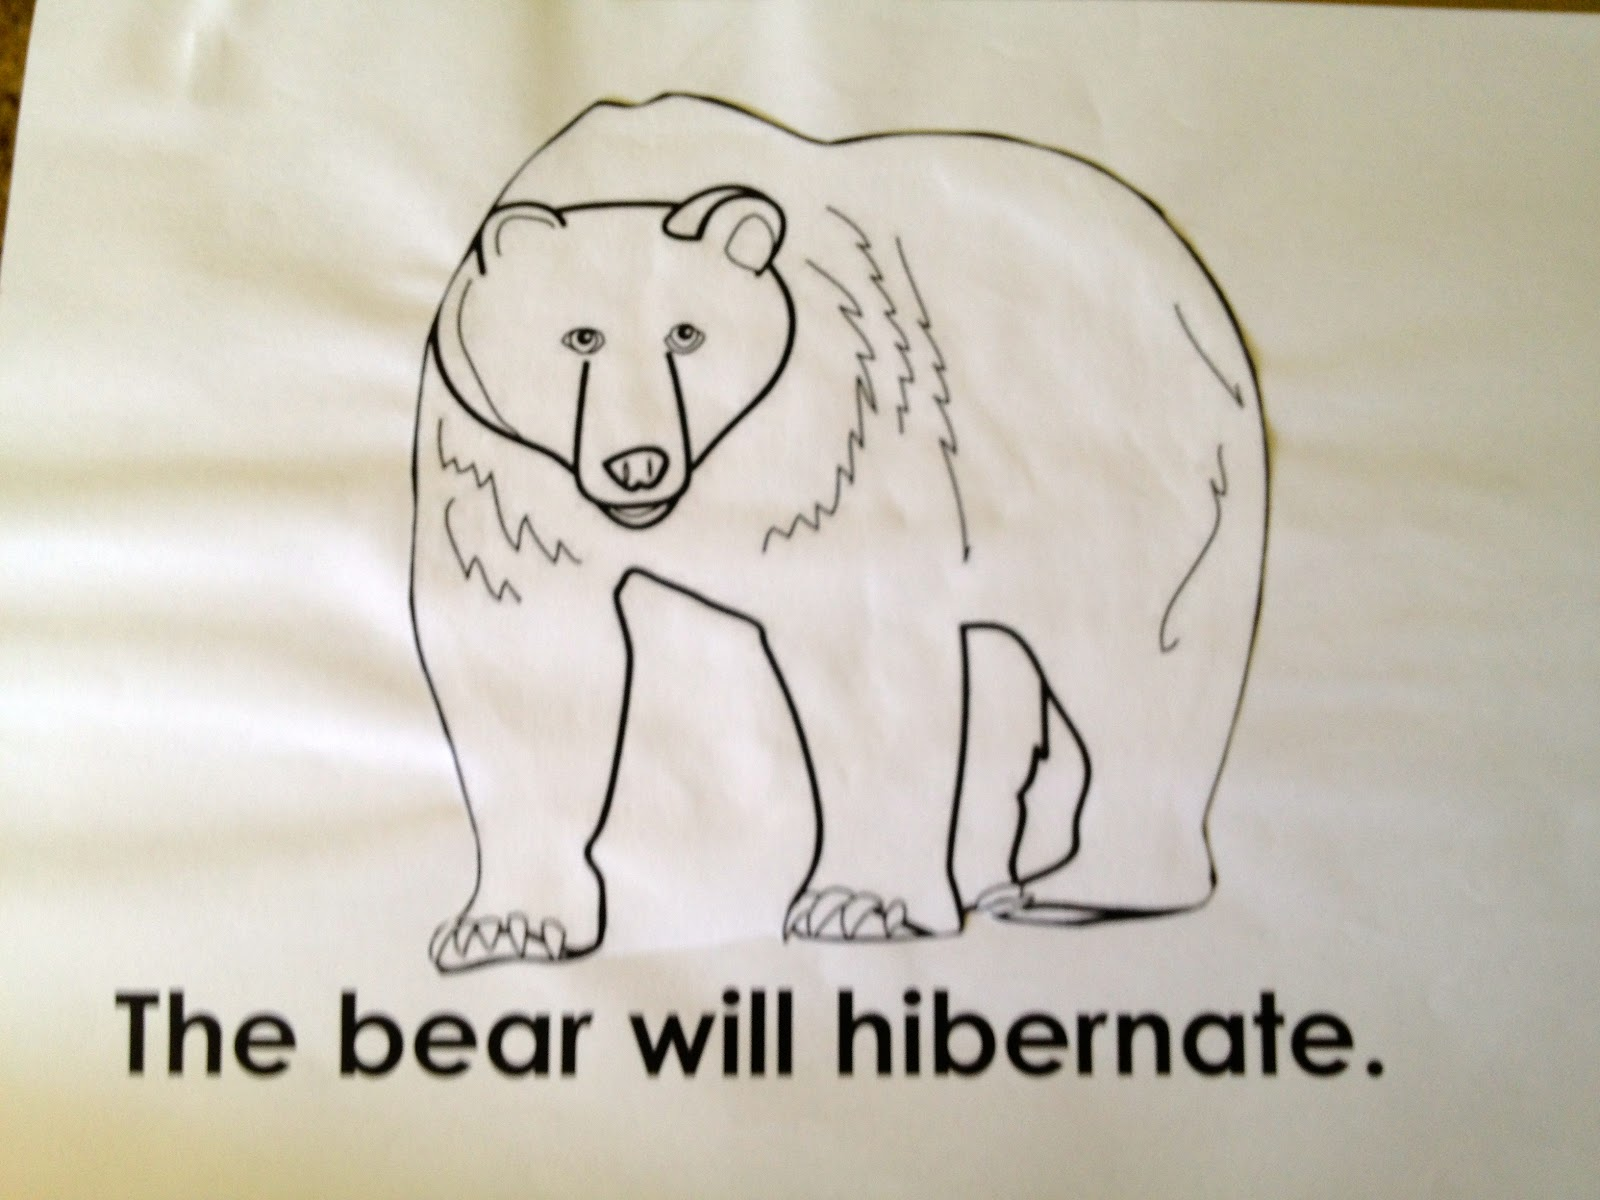 Hibernating Animals Coloring Pages - Costumepartyrun